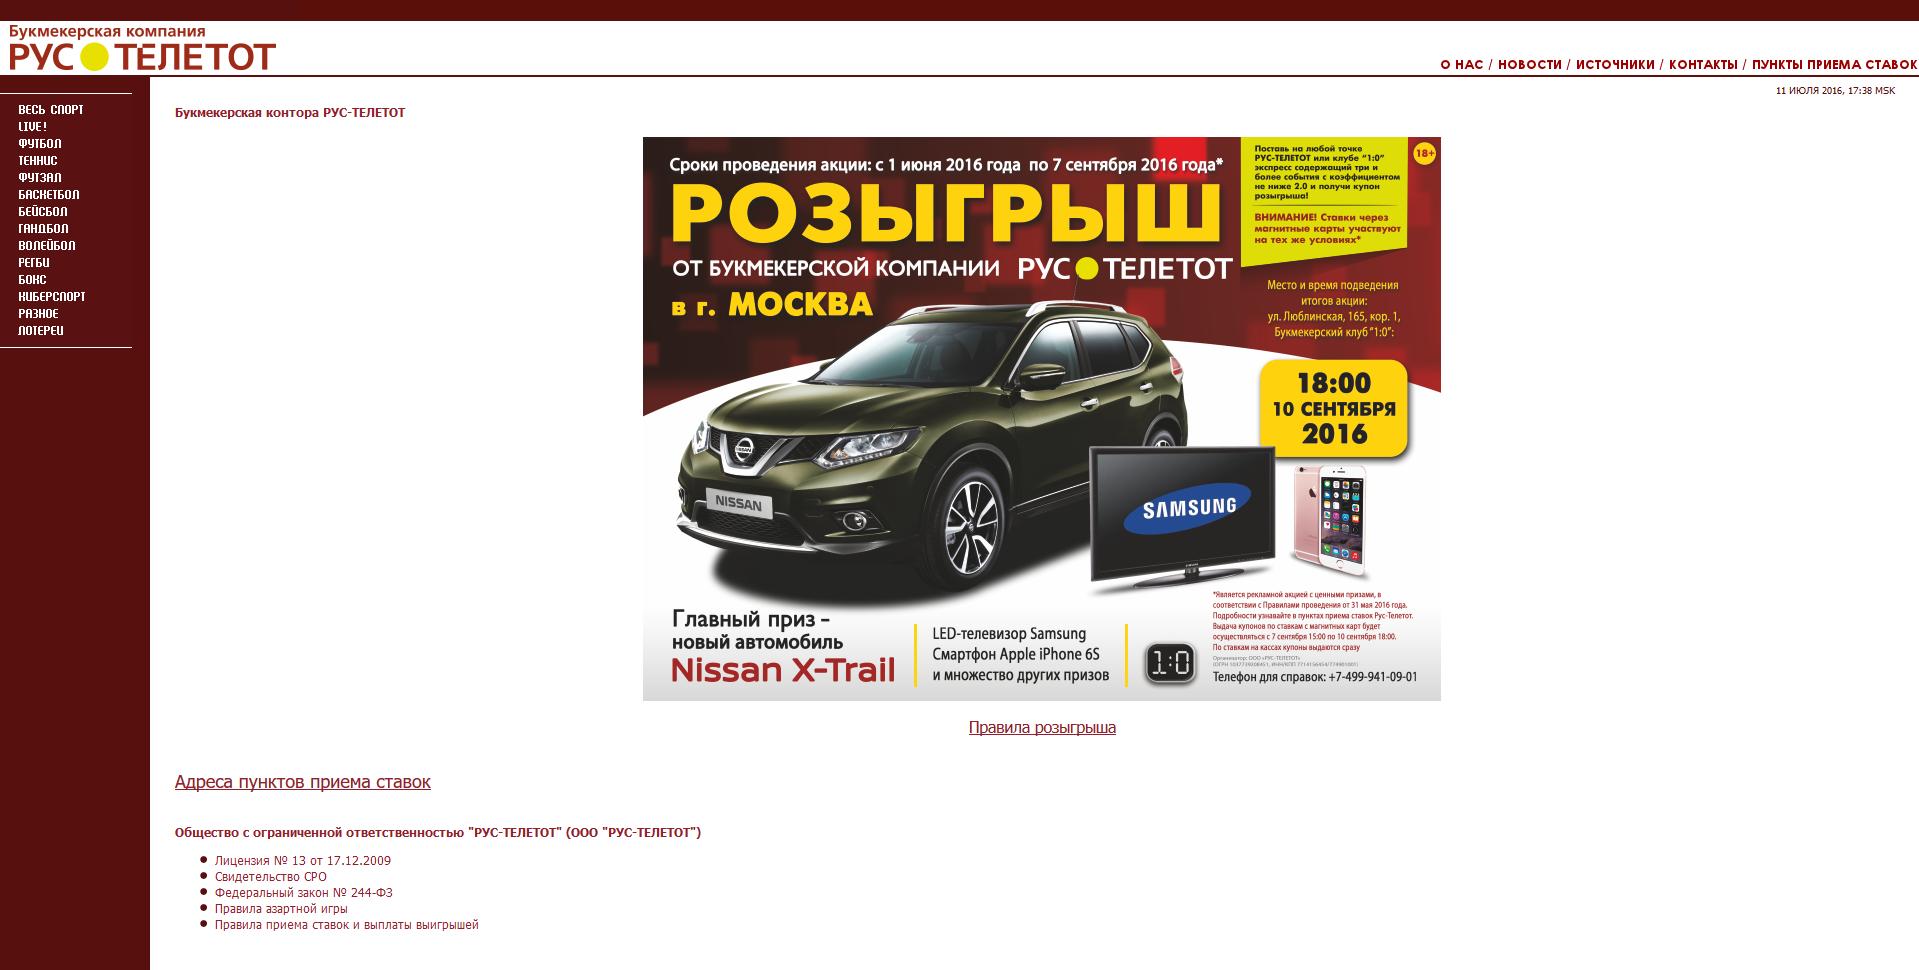 Сайт БК РусТелетот